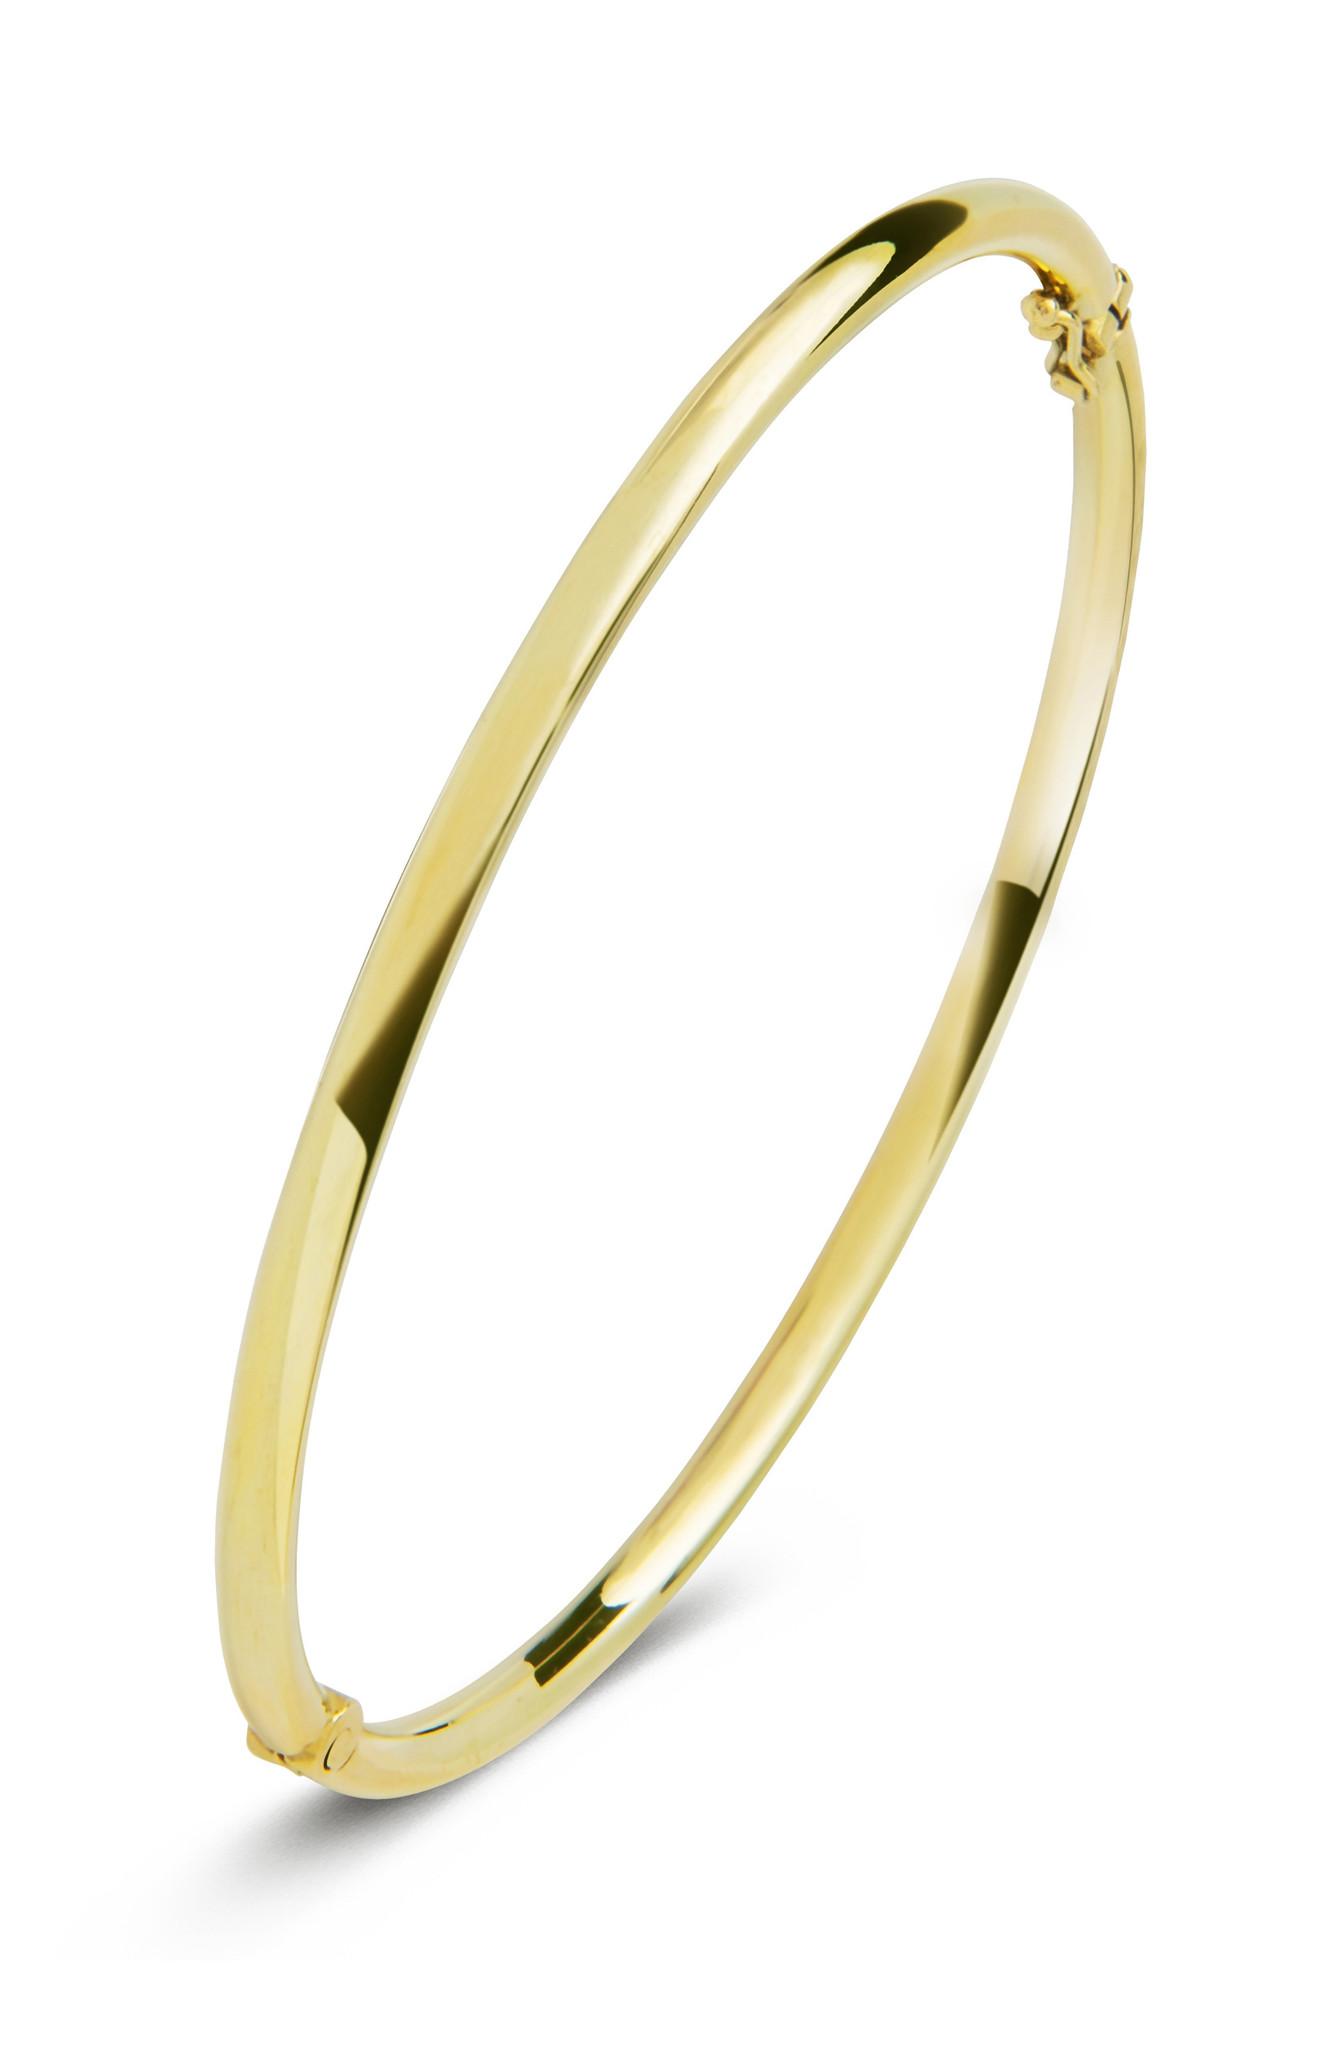 14 karaat geelgouden armband - Rond 3 mm - Fjory - Slavenarmband-2